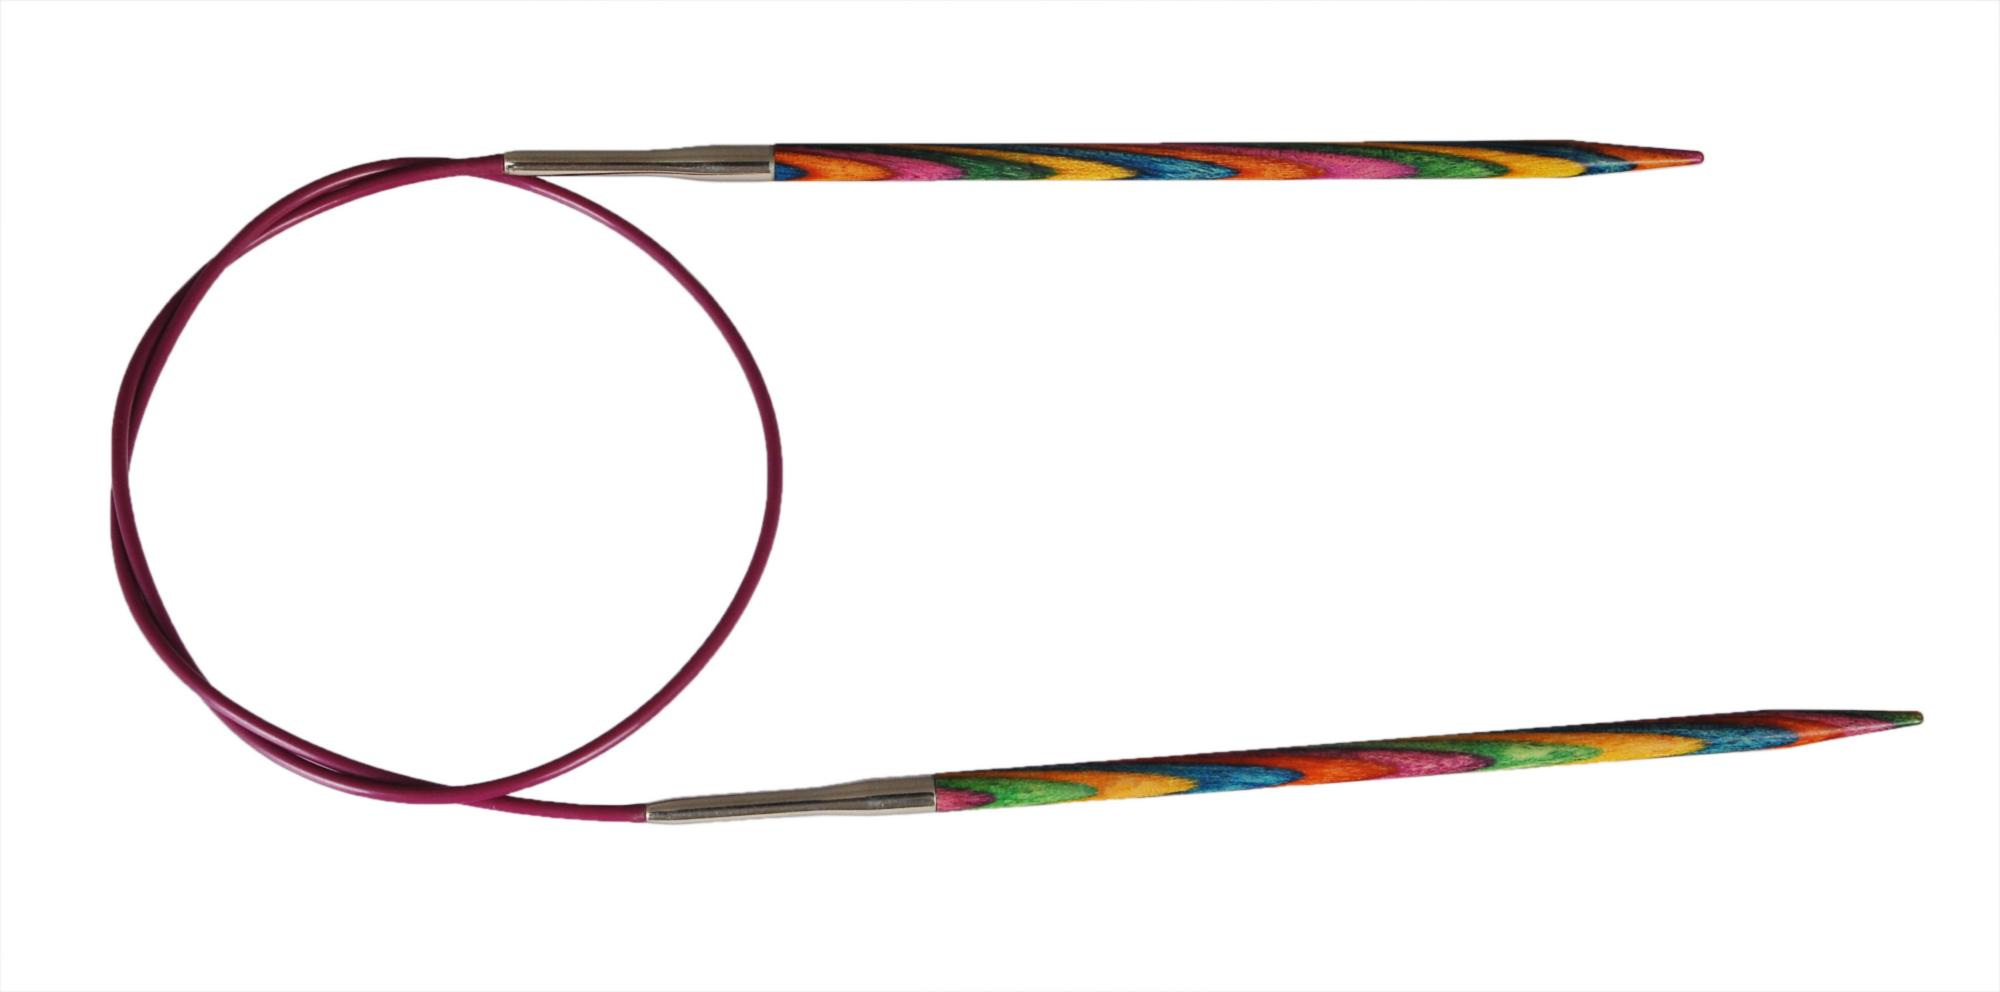 Спицы круговые 80 см Symfonie Wood KnitPro, 21336, 3.75 мм